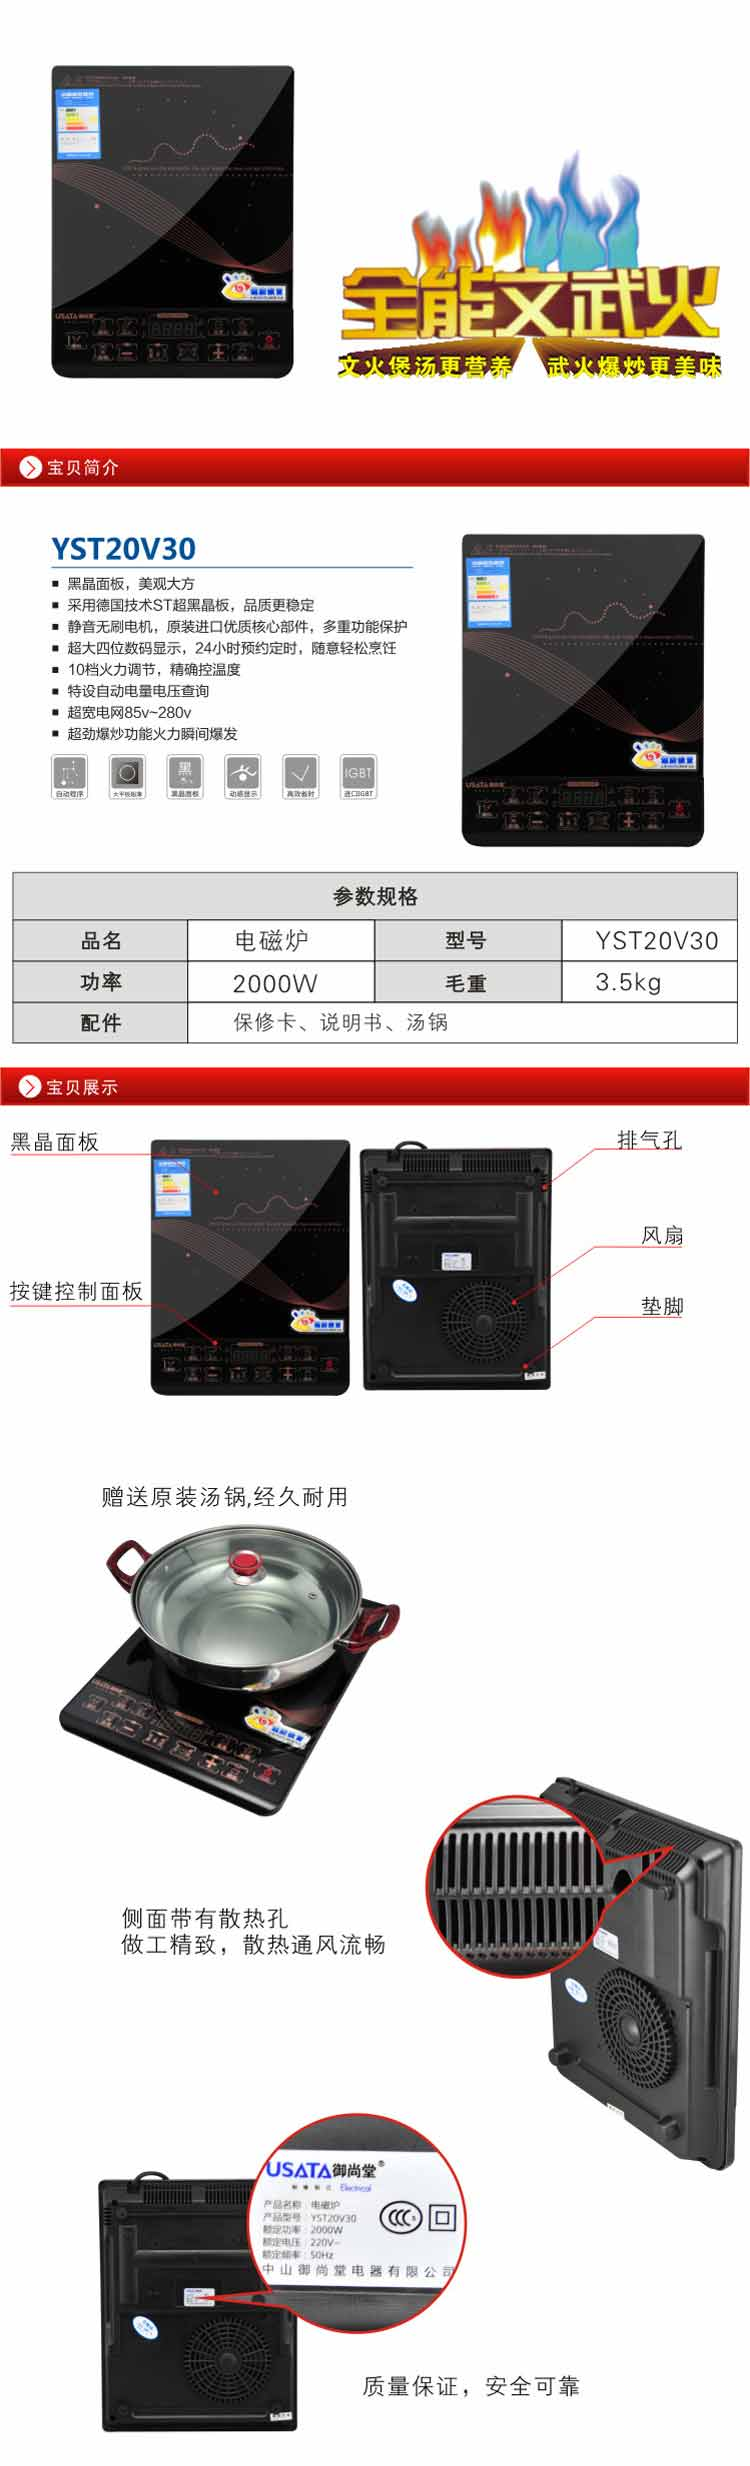 usata御尚堂电磁炉yst20v30电脑版2000w (赠送350克加厚汤锅)超级爆炒